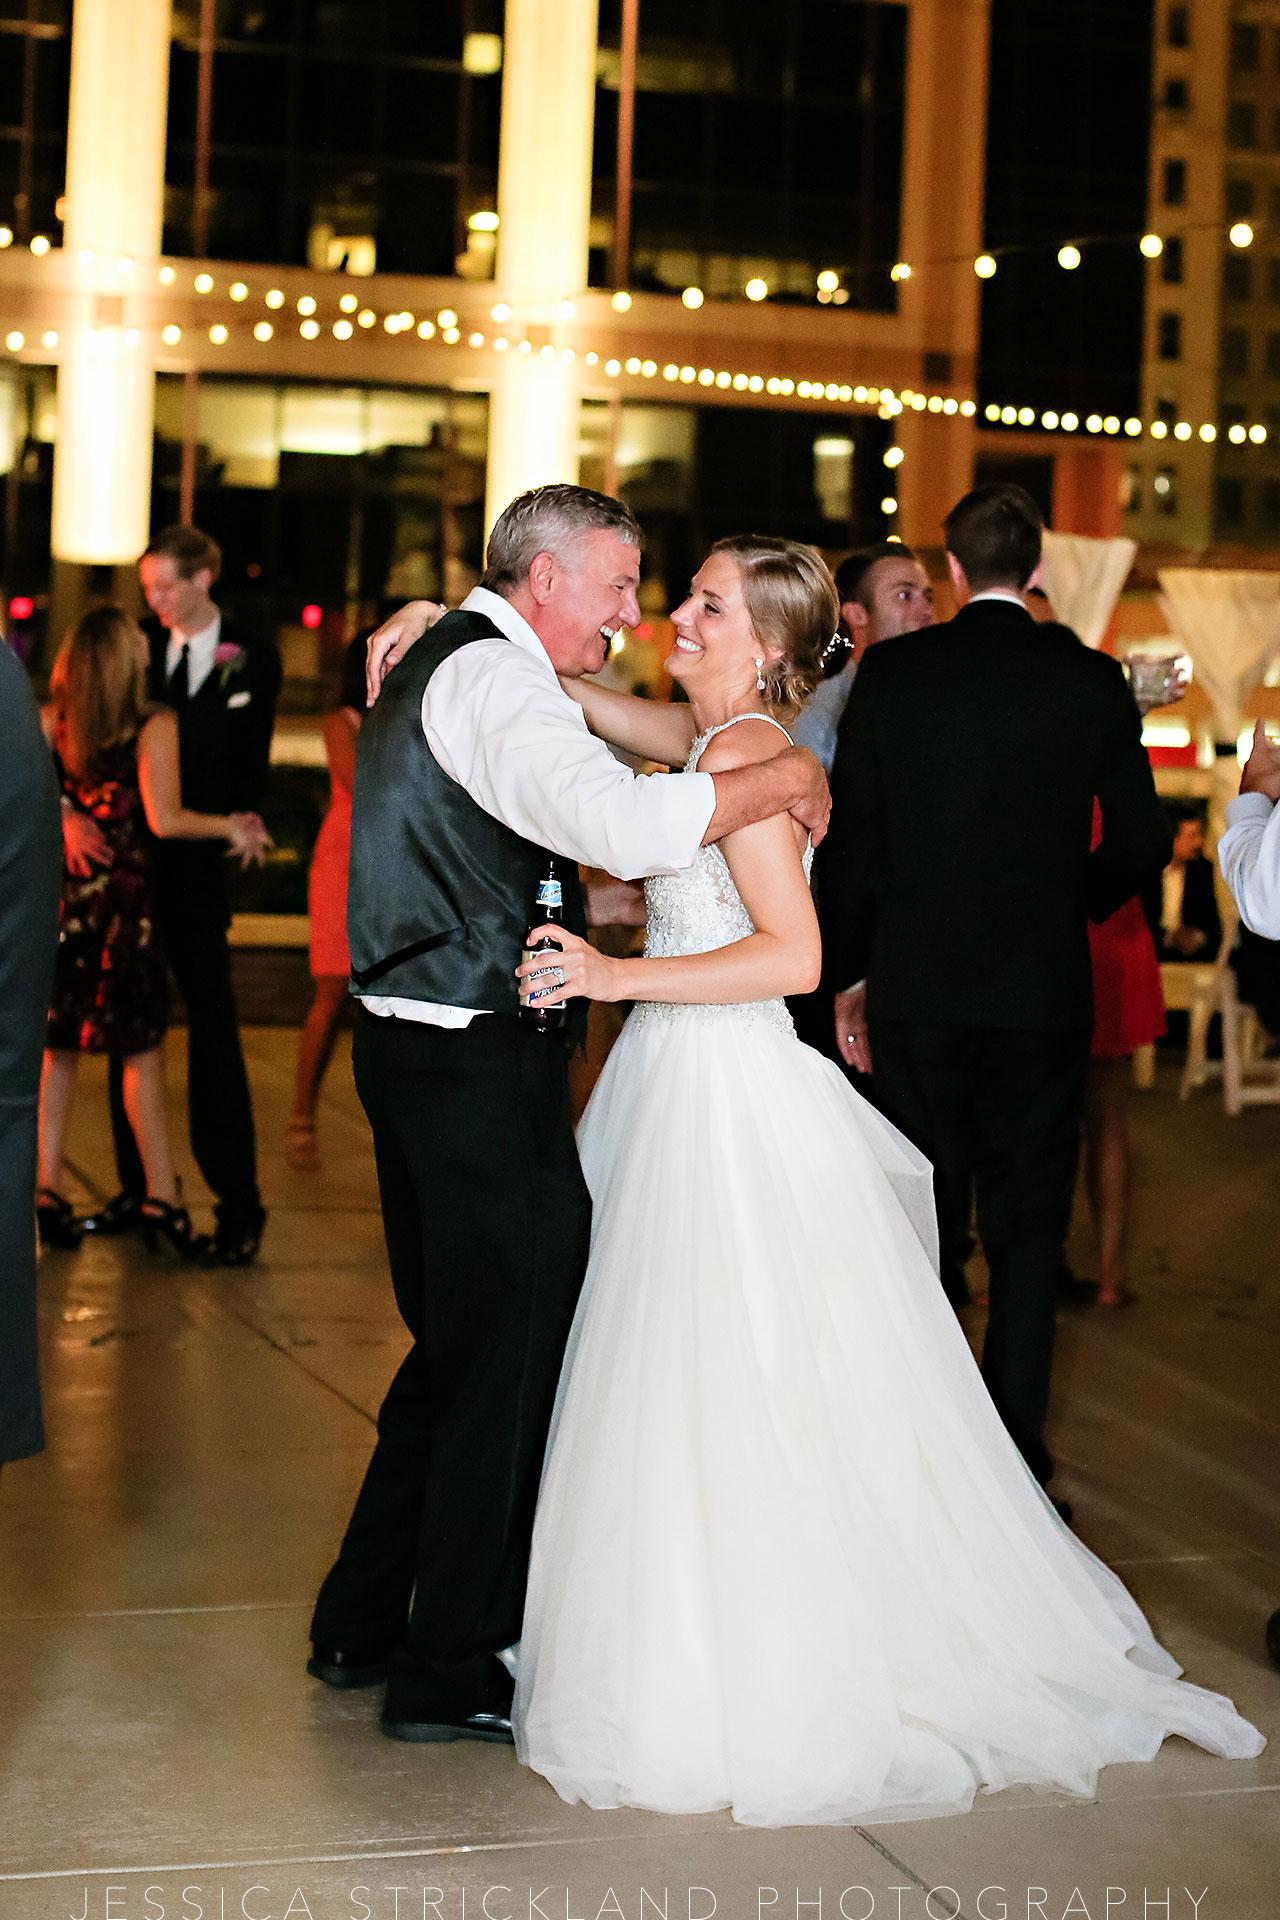 Serra Alex Regions Tower Indianapolis Wedding 413 watermarked